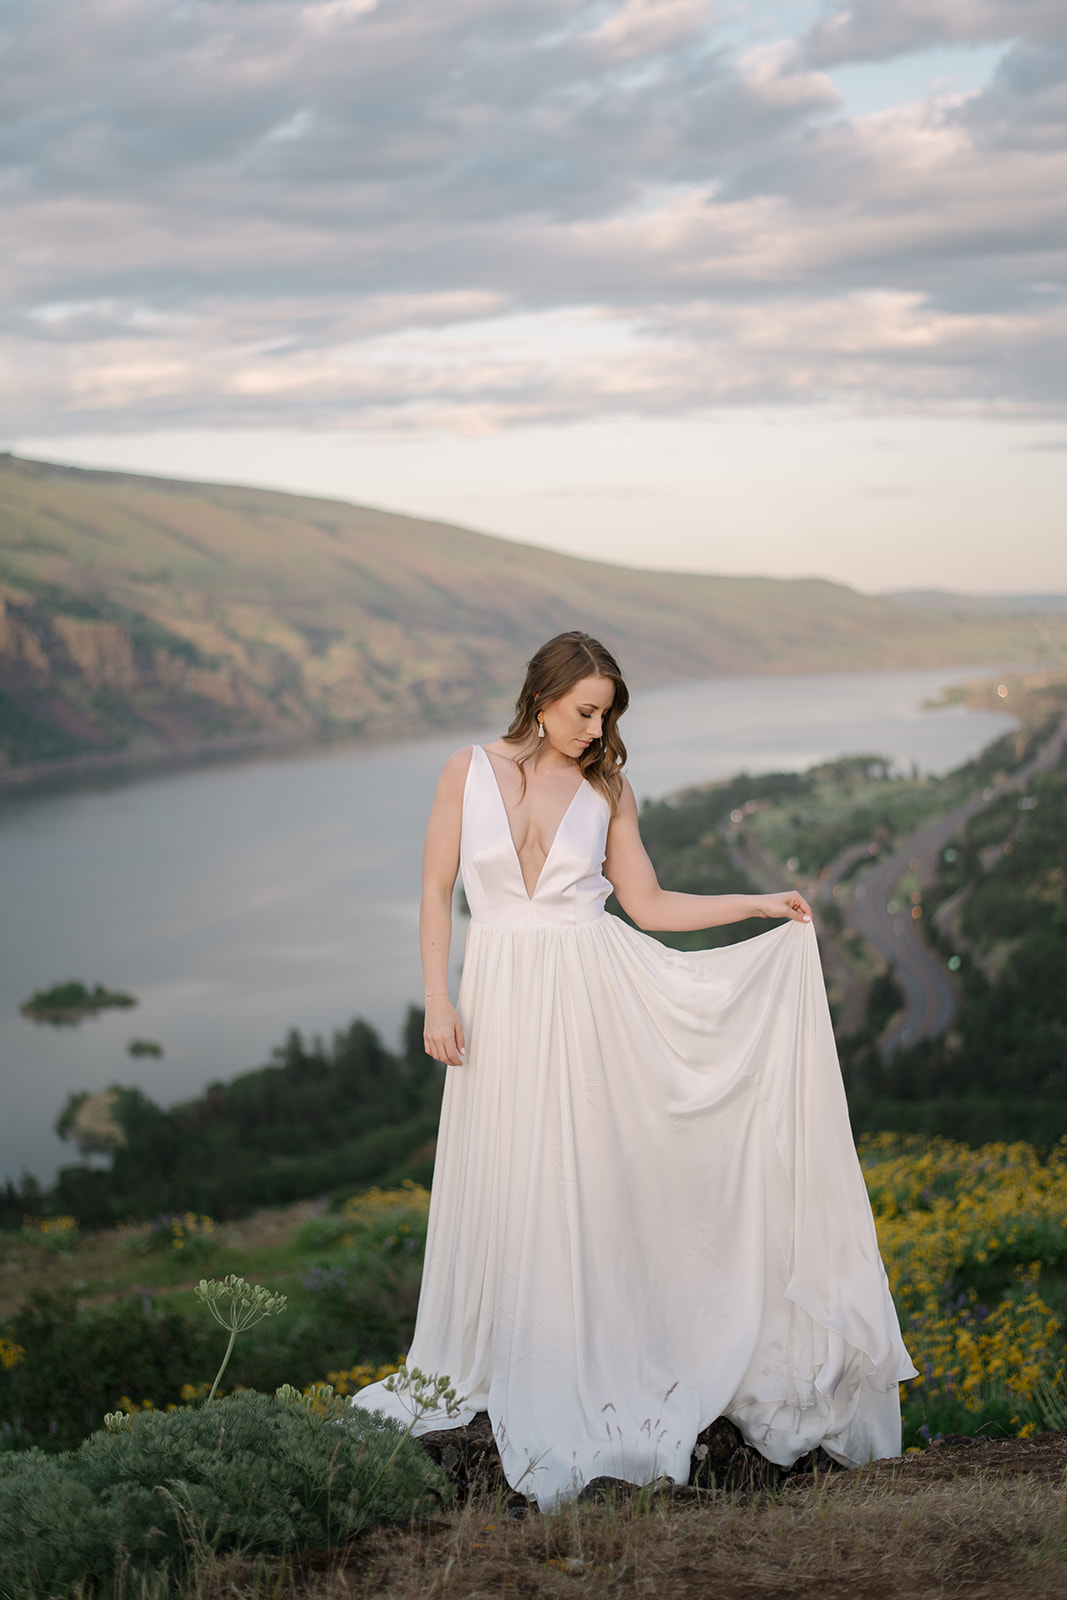 kamea_events_wedding_planner_portland_DeusAmor83.jpg